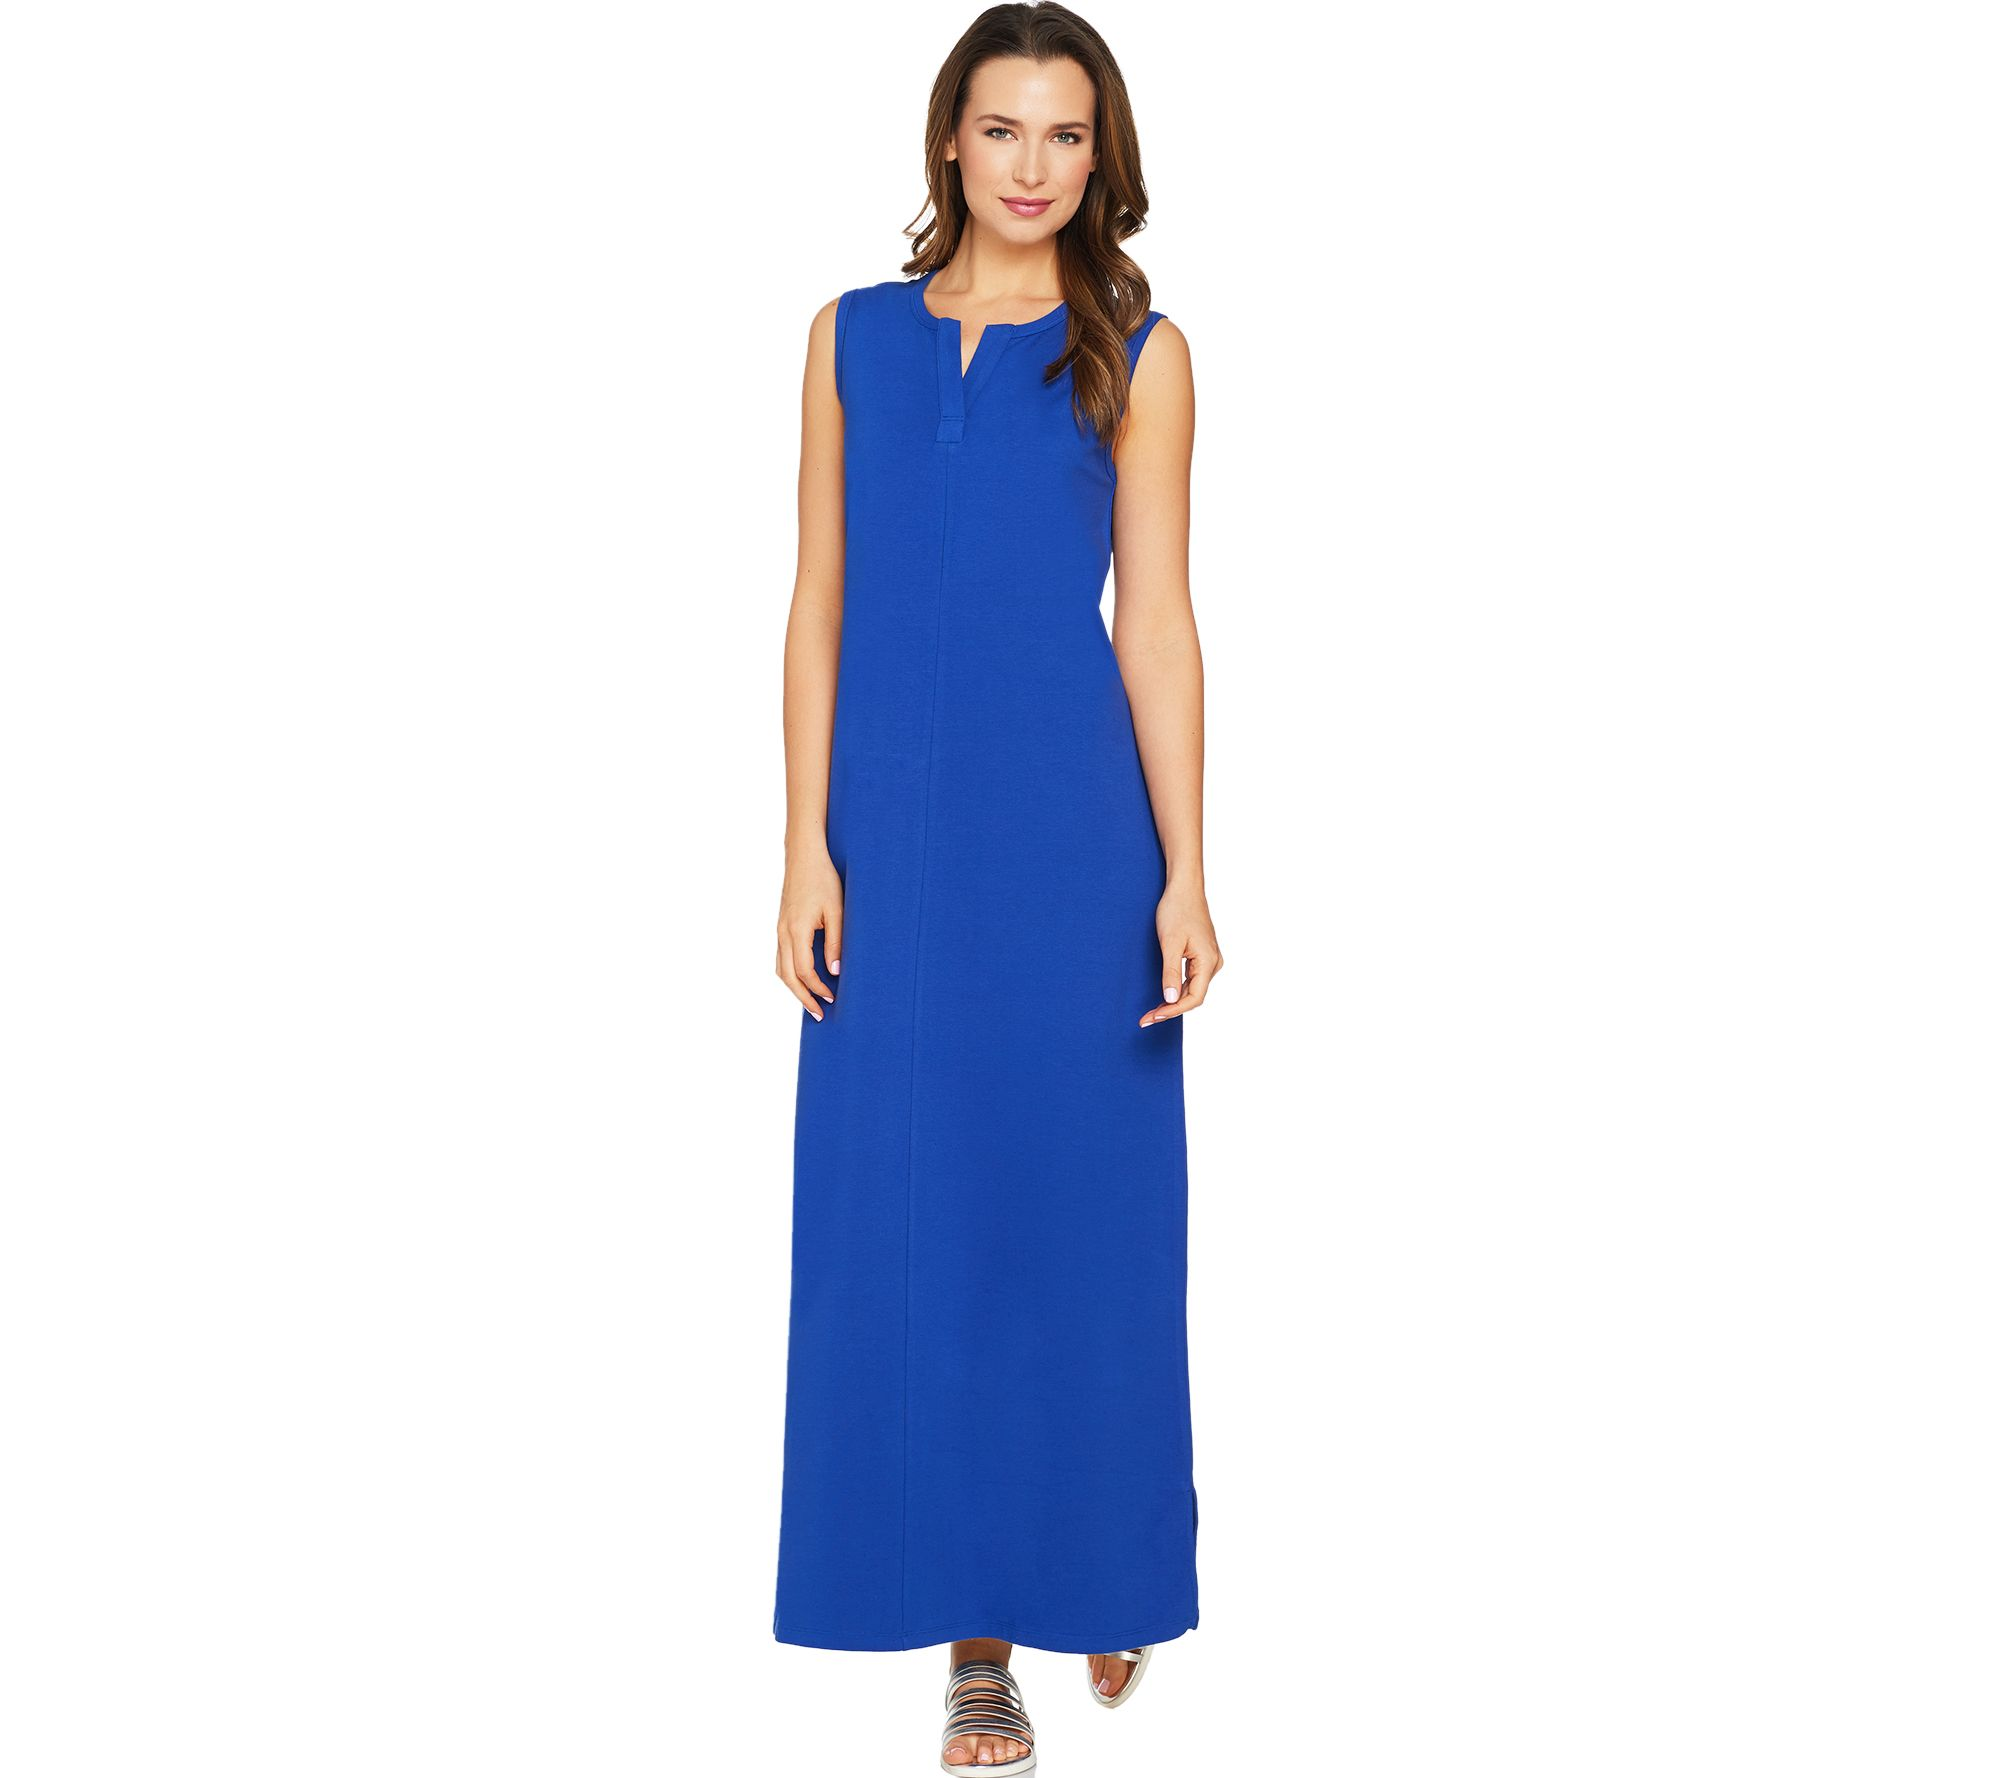 Denim & Co. Petite Sleeveless Perfect Jersey Maxi Dress - A290201